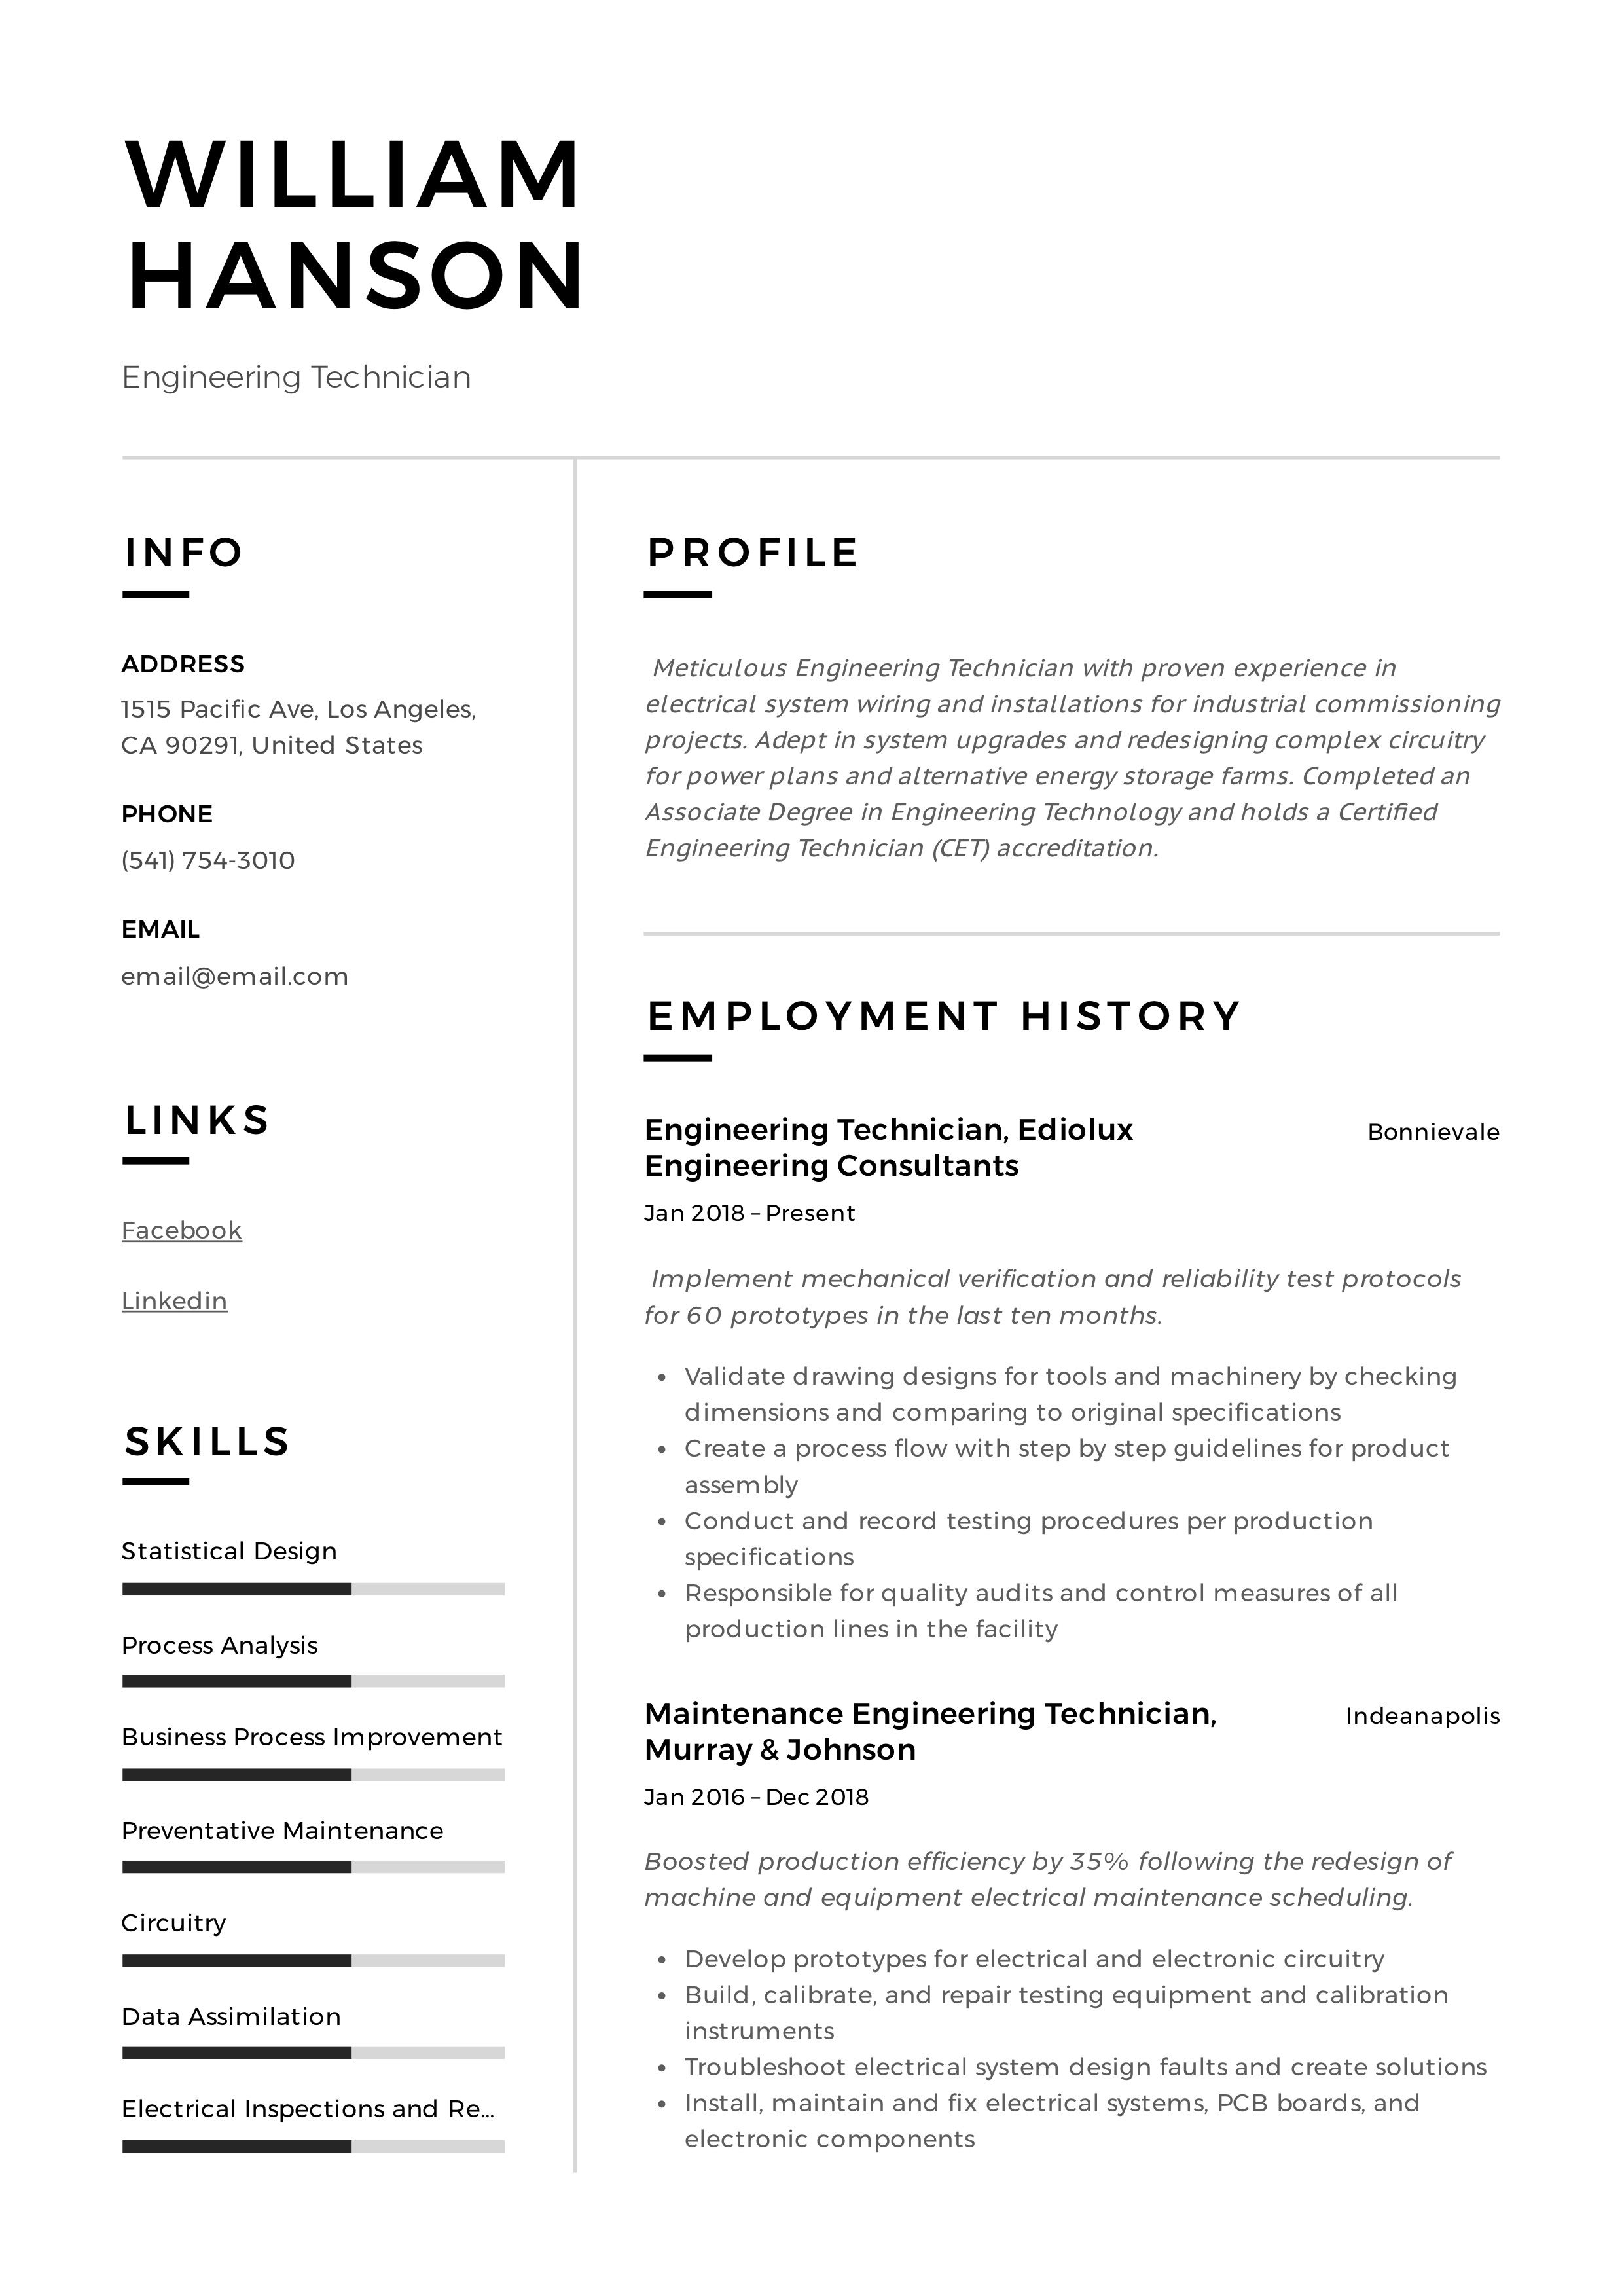 Engineering technician resume writing guide 12